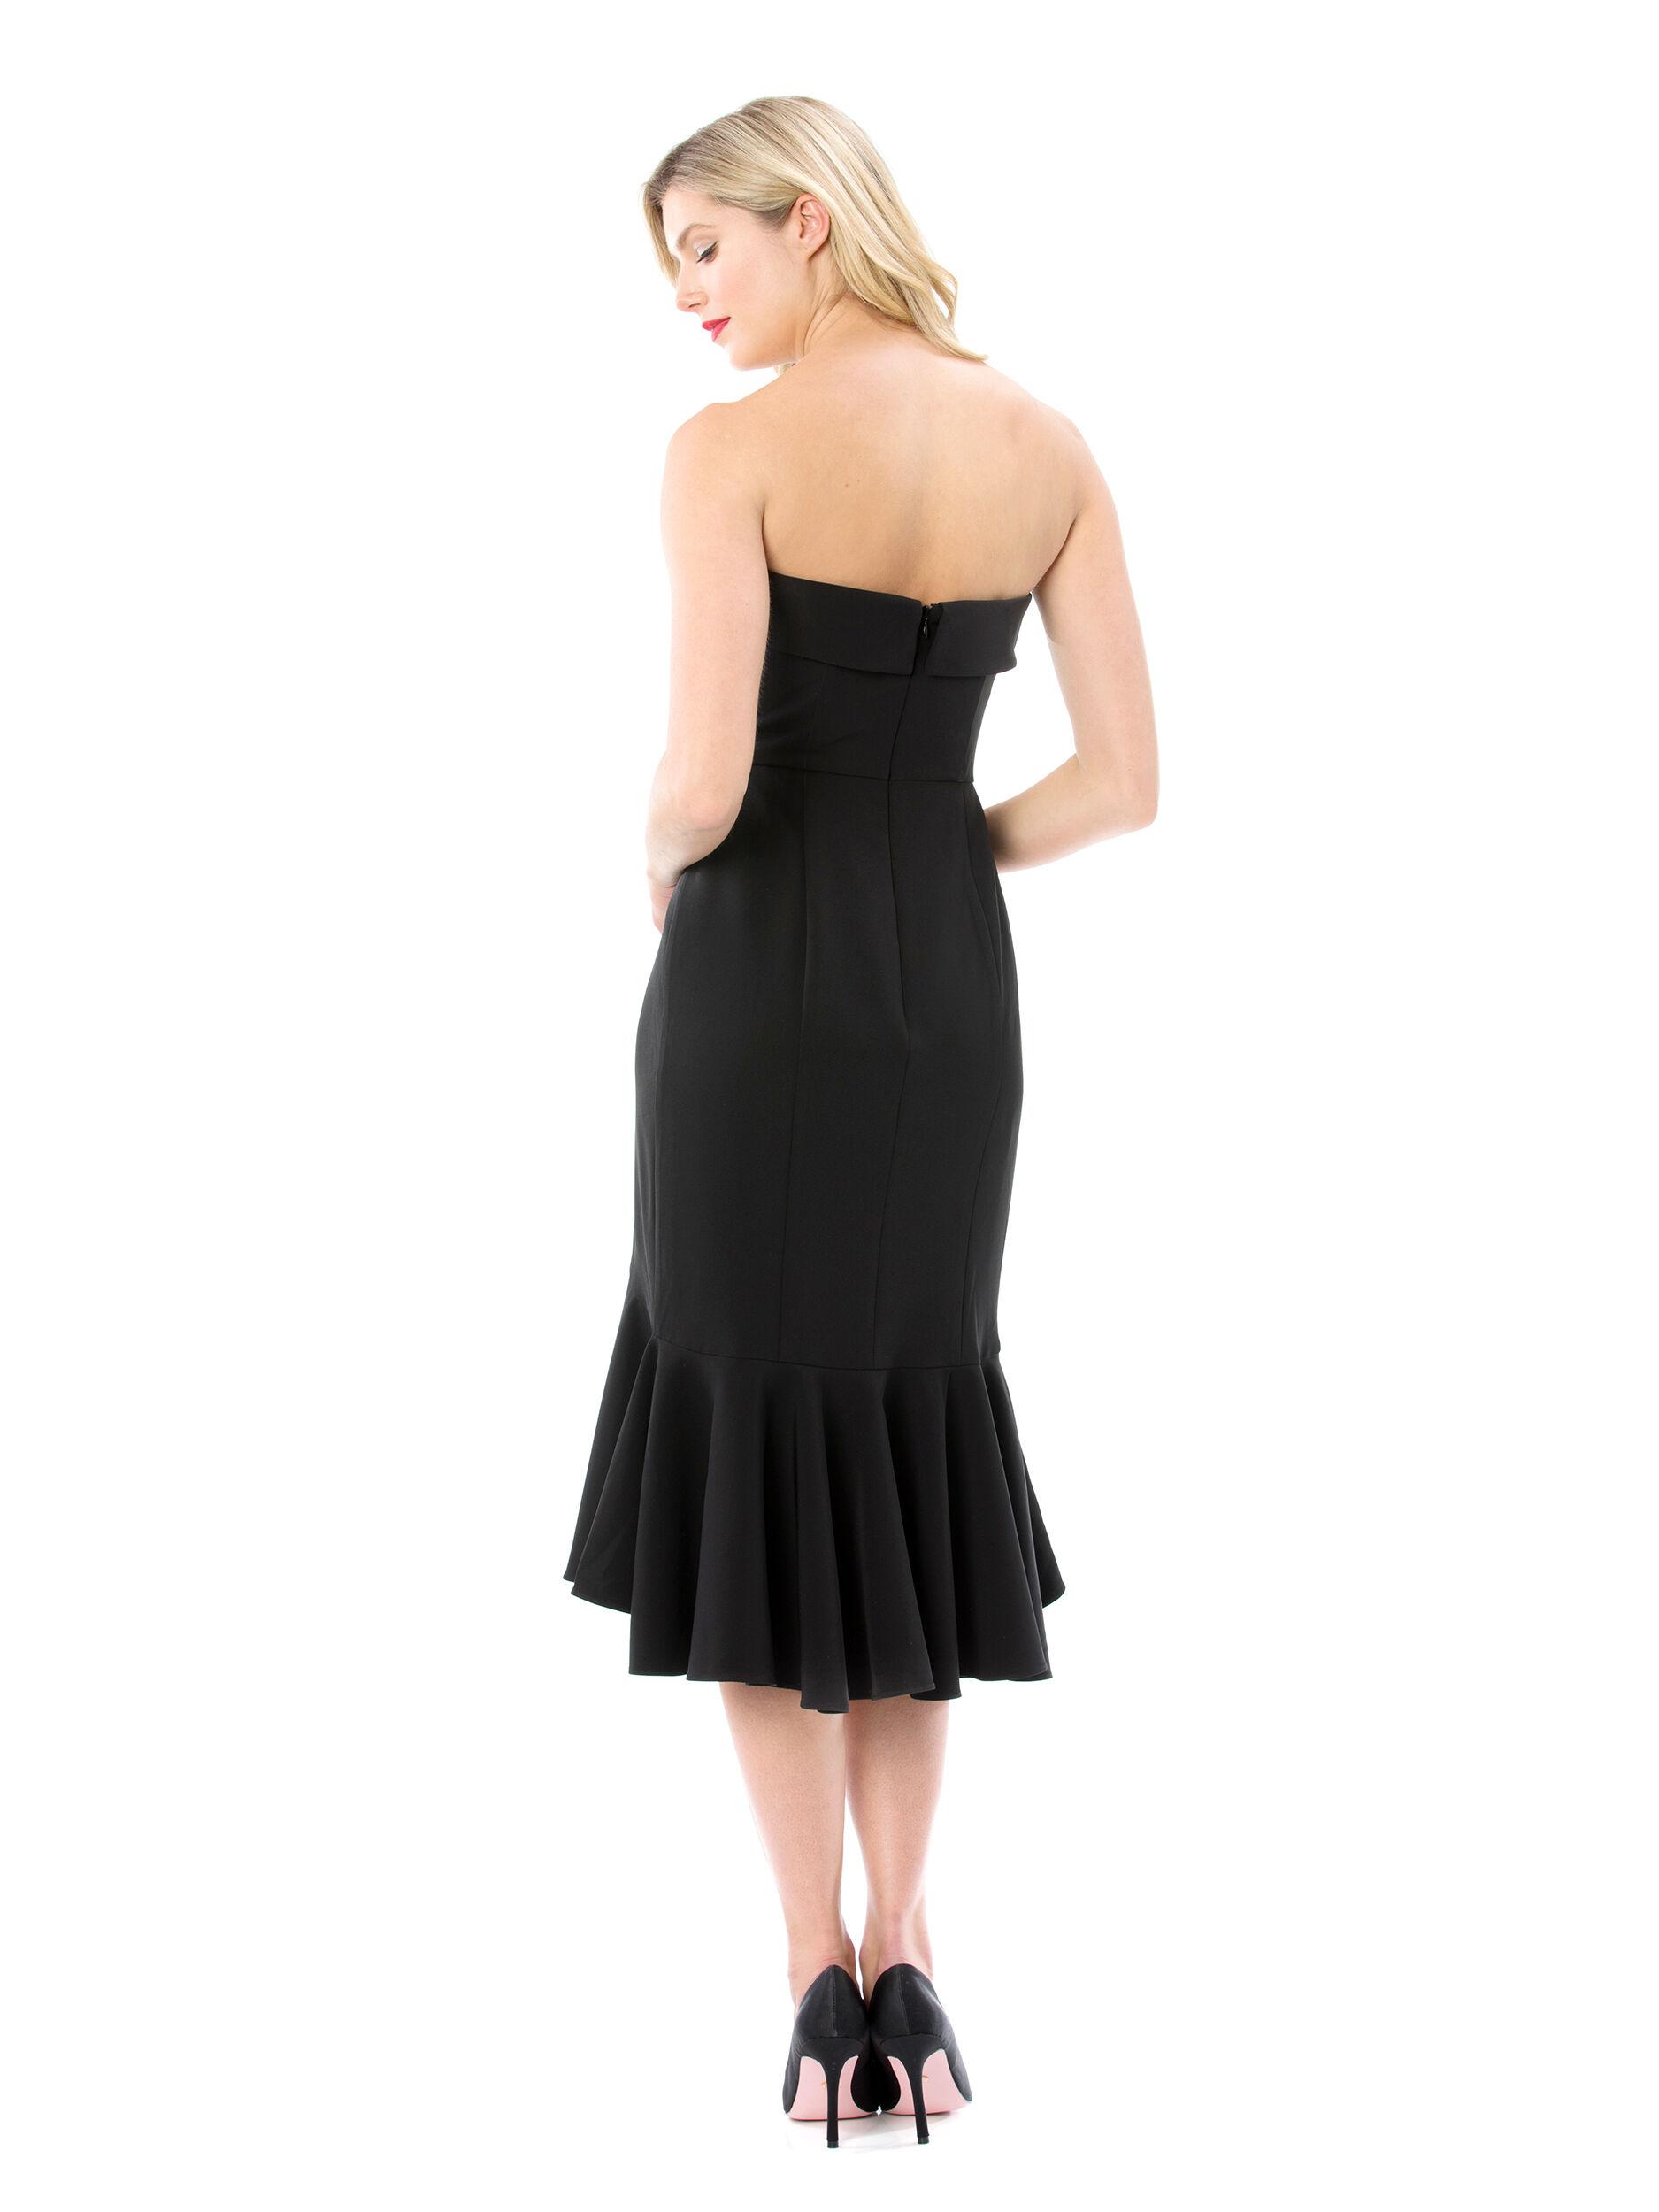 Lost In Love Dress